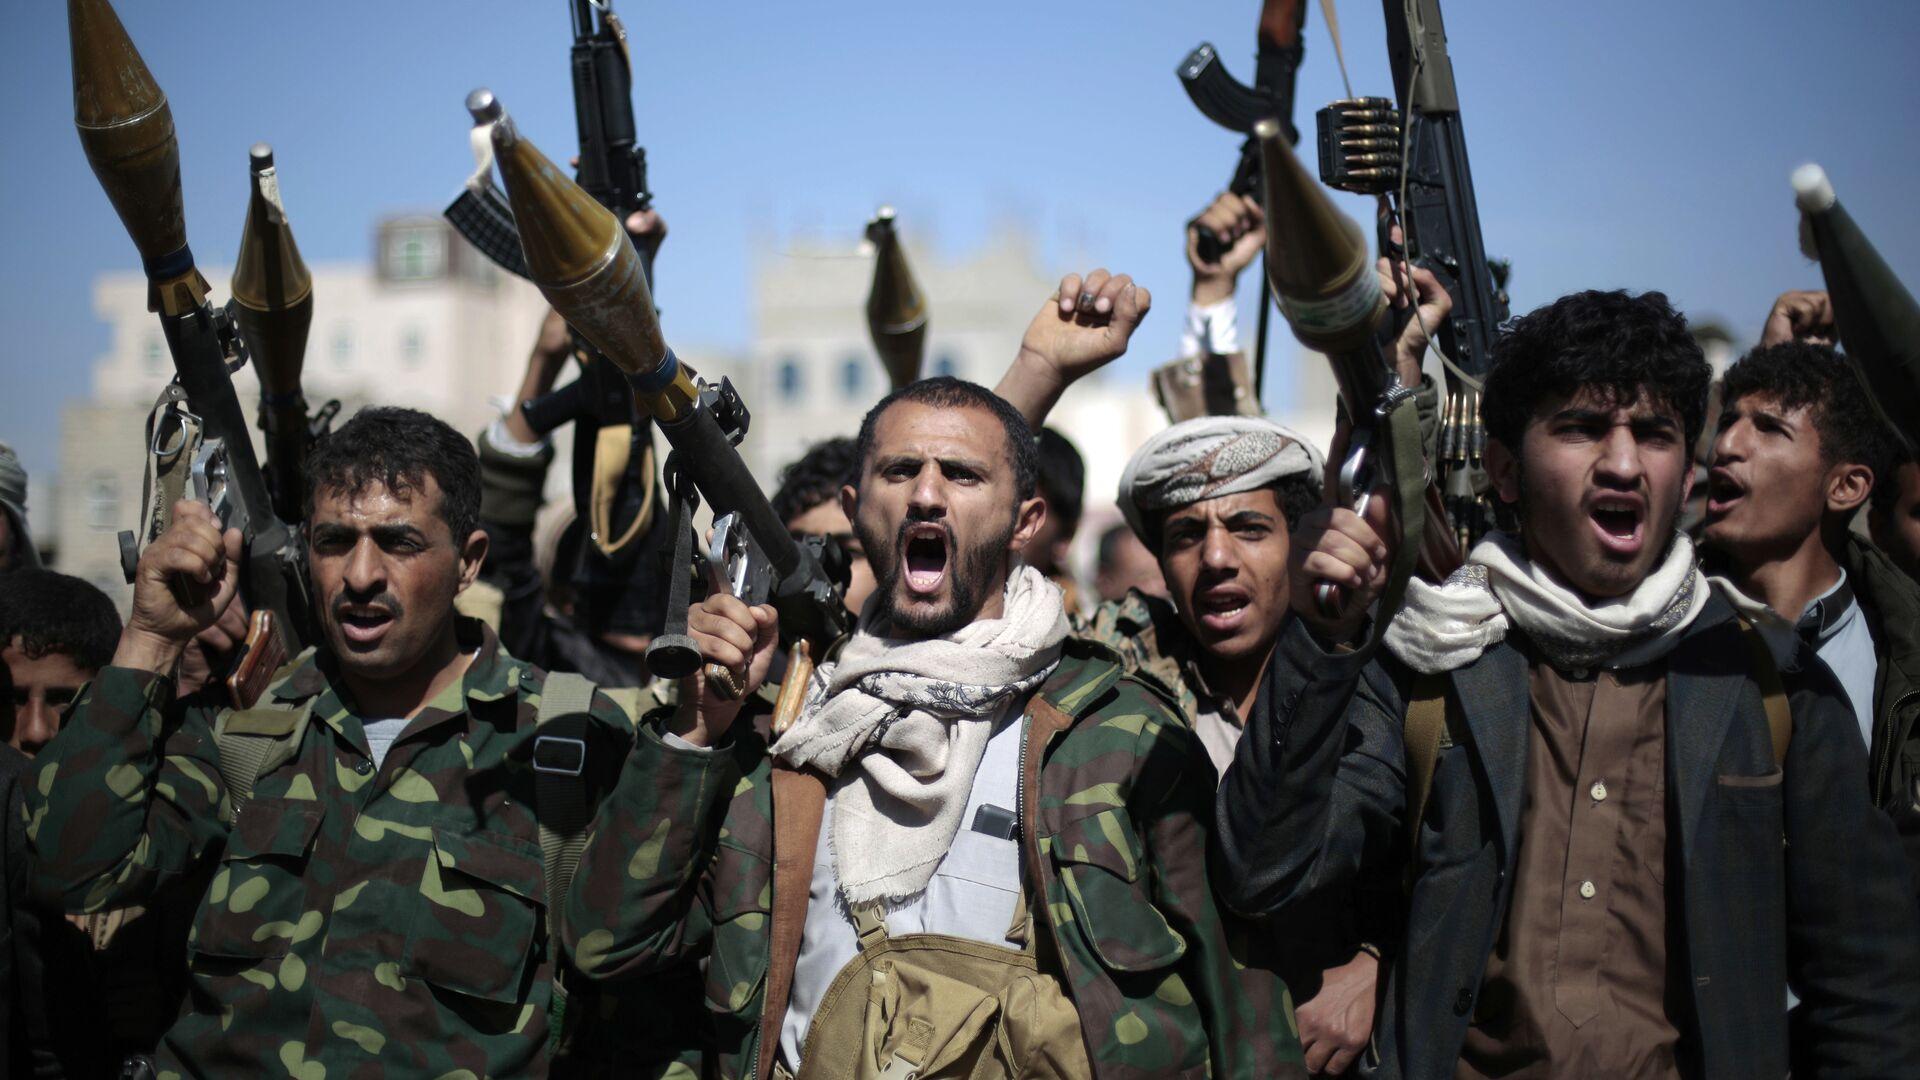 Rebeldes hutíes en Yemen (archivo) - Sputnik Mundo, 1920, 12.02.2021